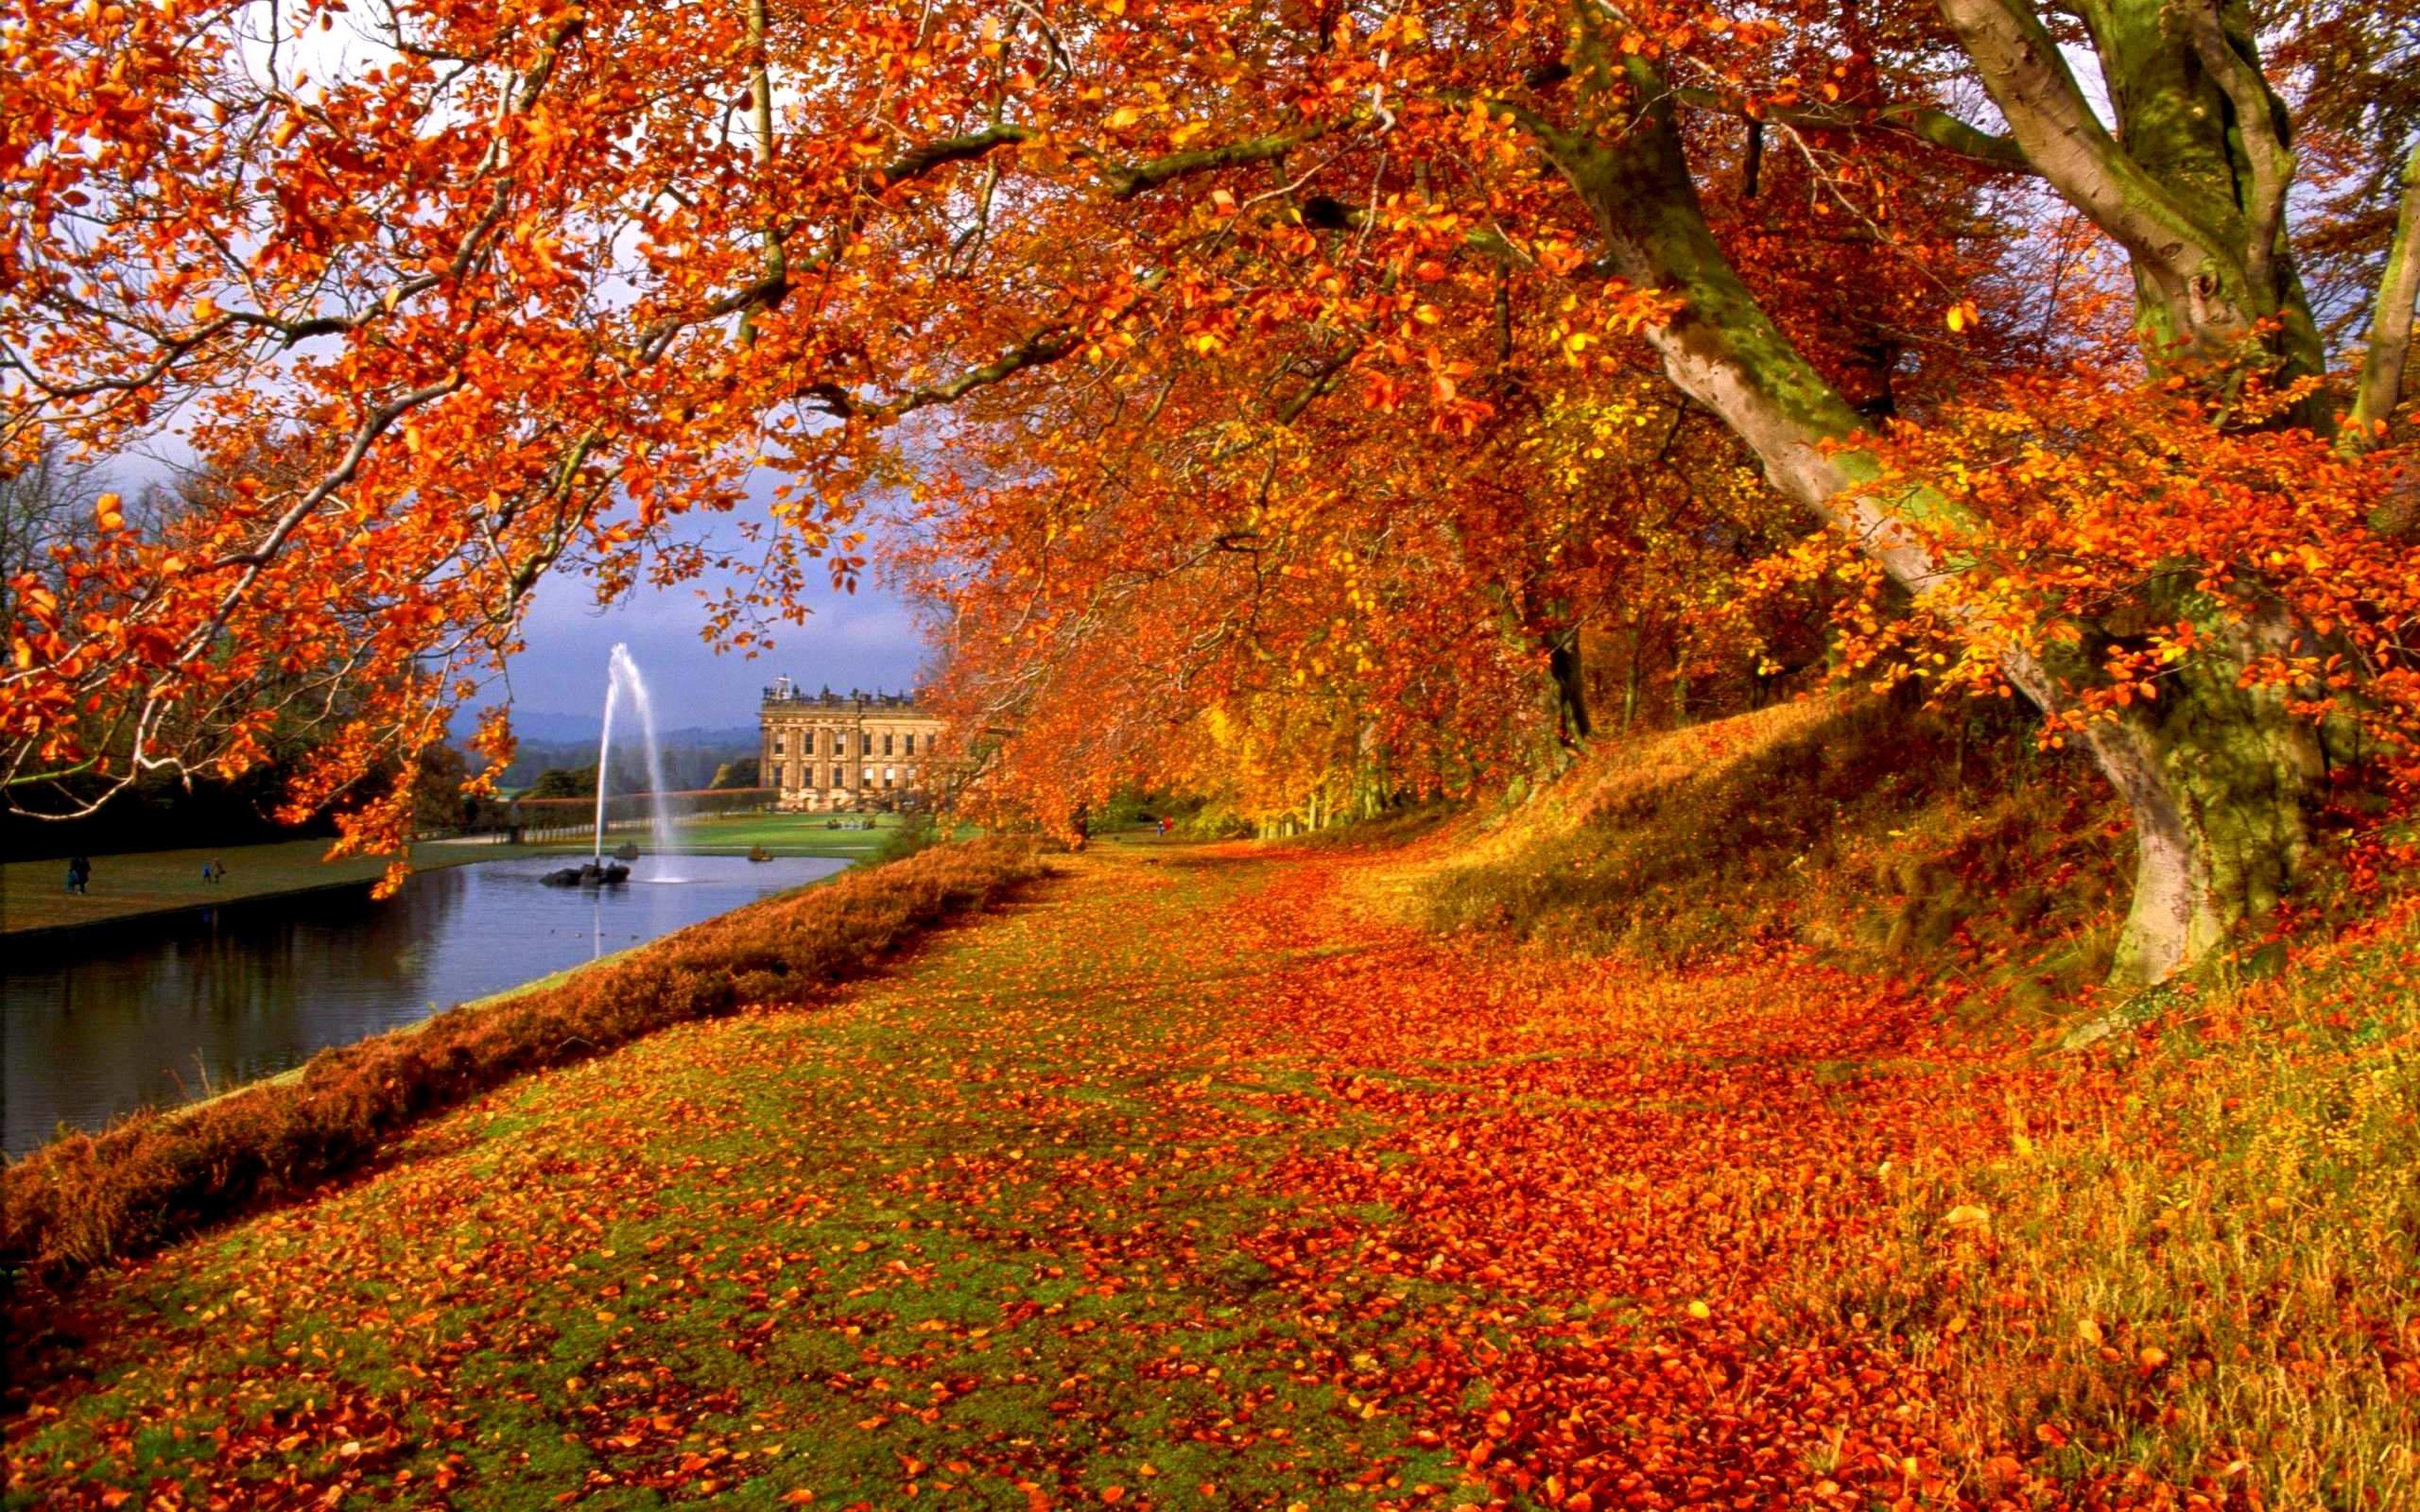 Fall Pictures Desktop Wallpaper (67+ images)